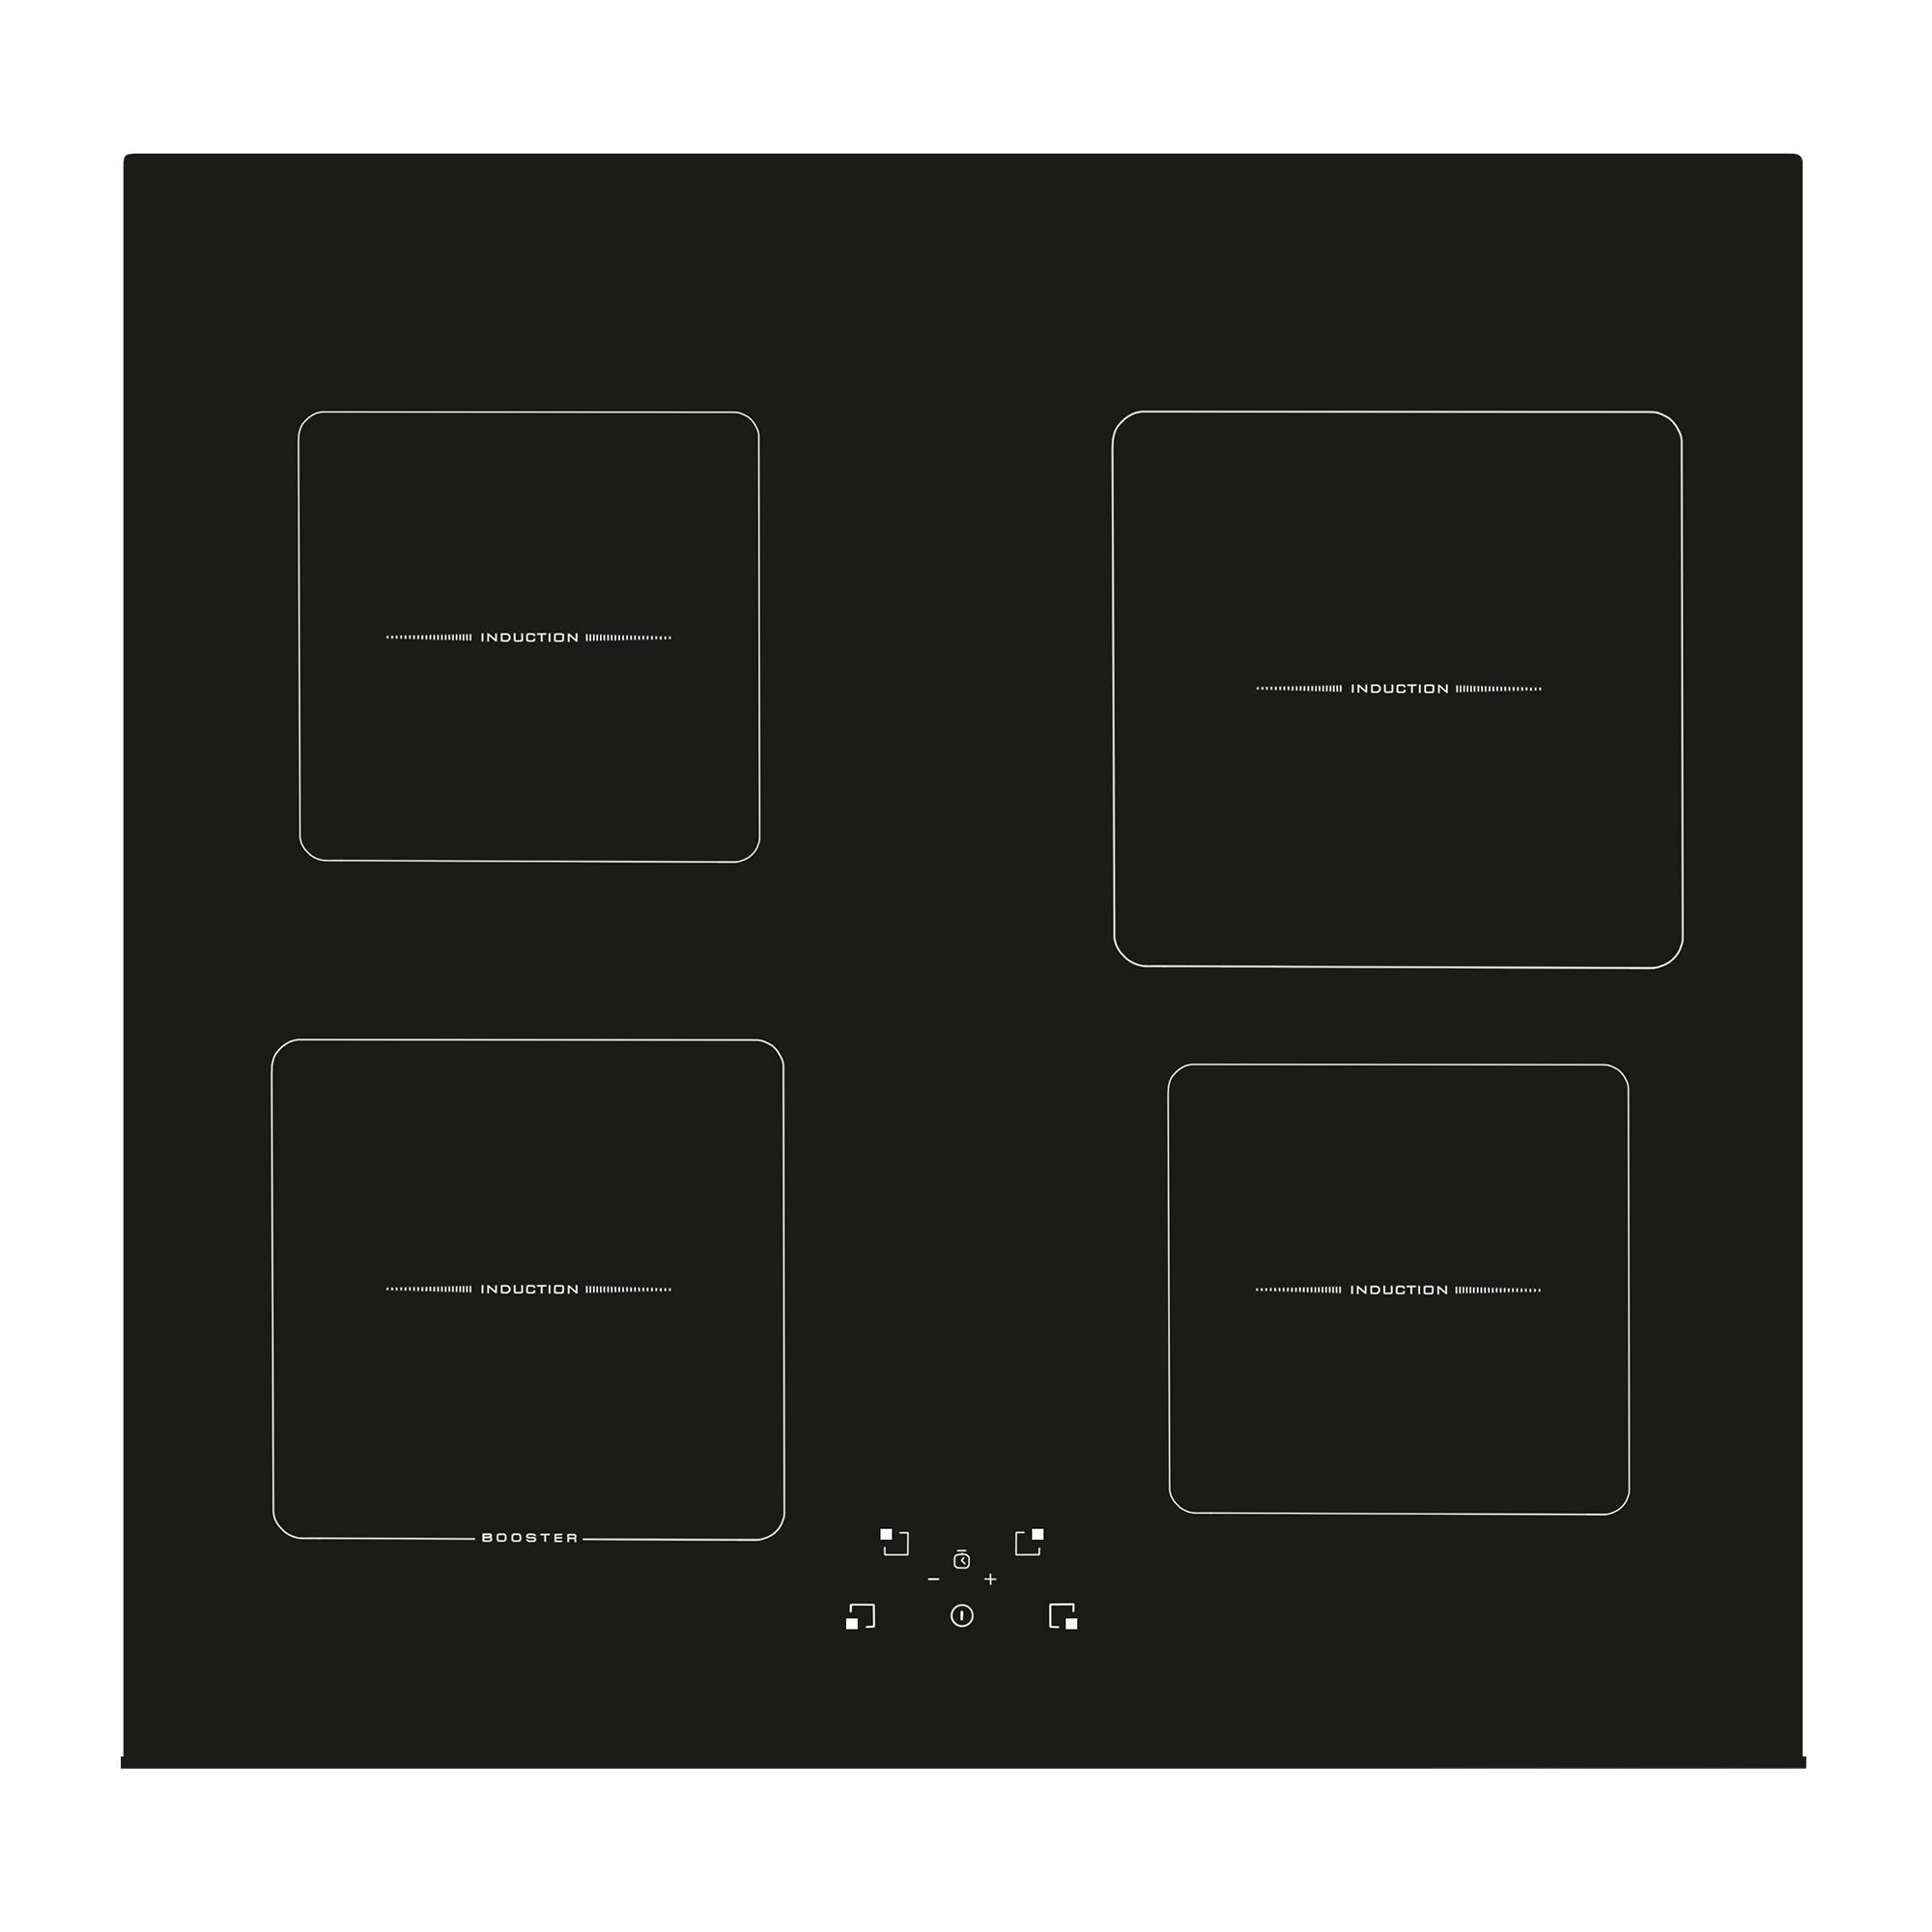 Электрическая плита Гефест 6570-04 0057